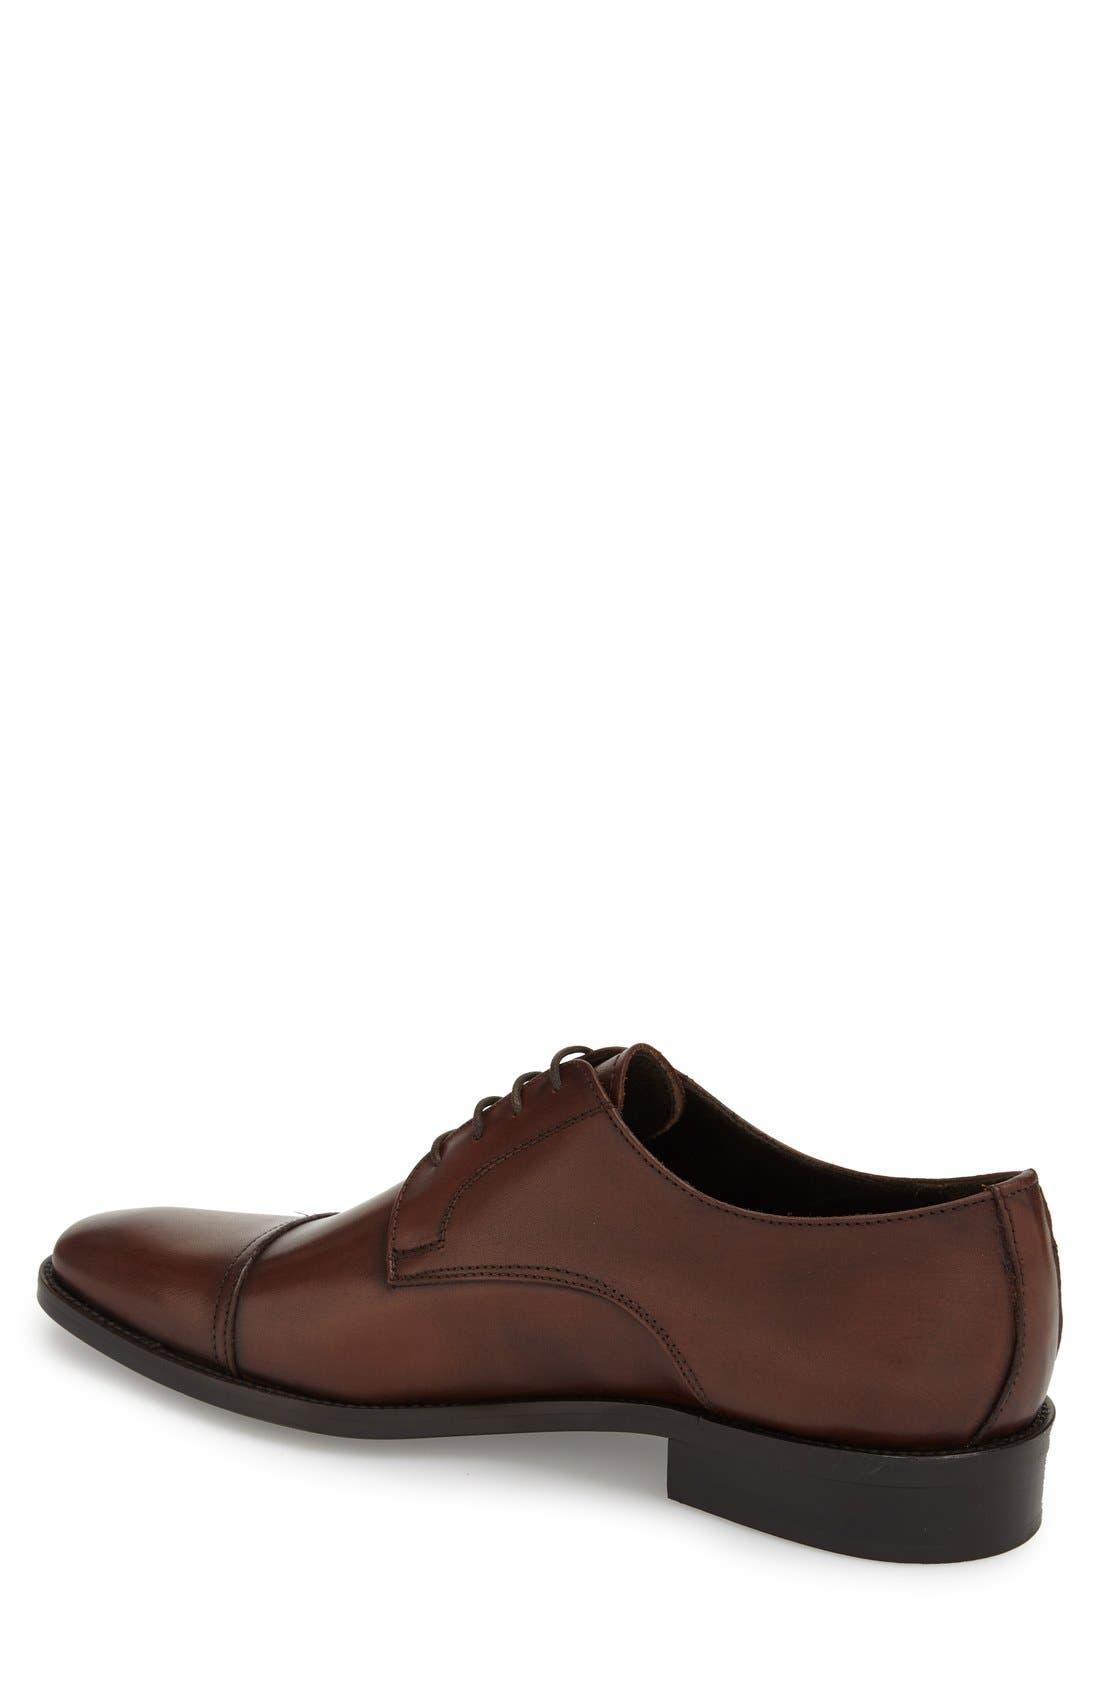 Alternate Image 2  - To Boot New York 'Maxwell' Cap Toe Derby (Men)